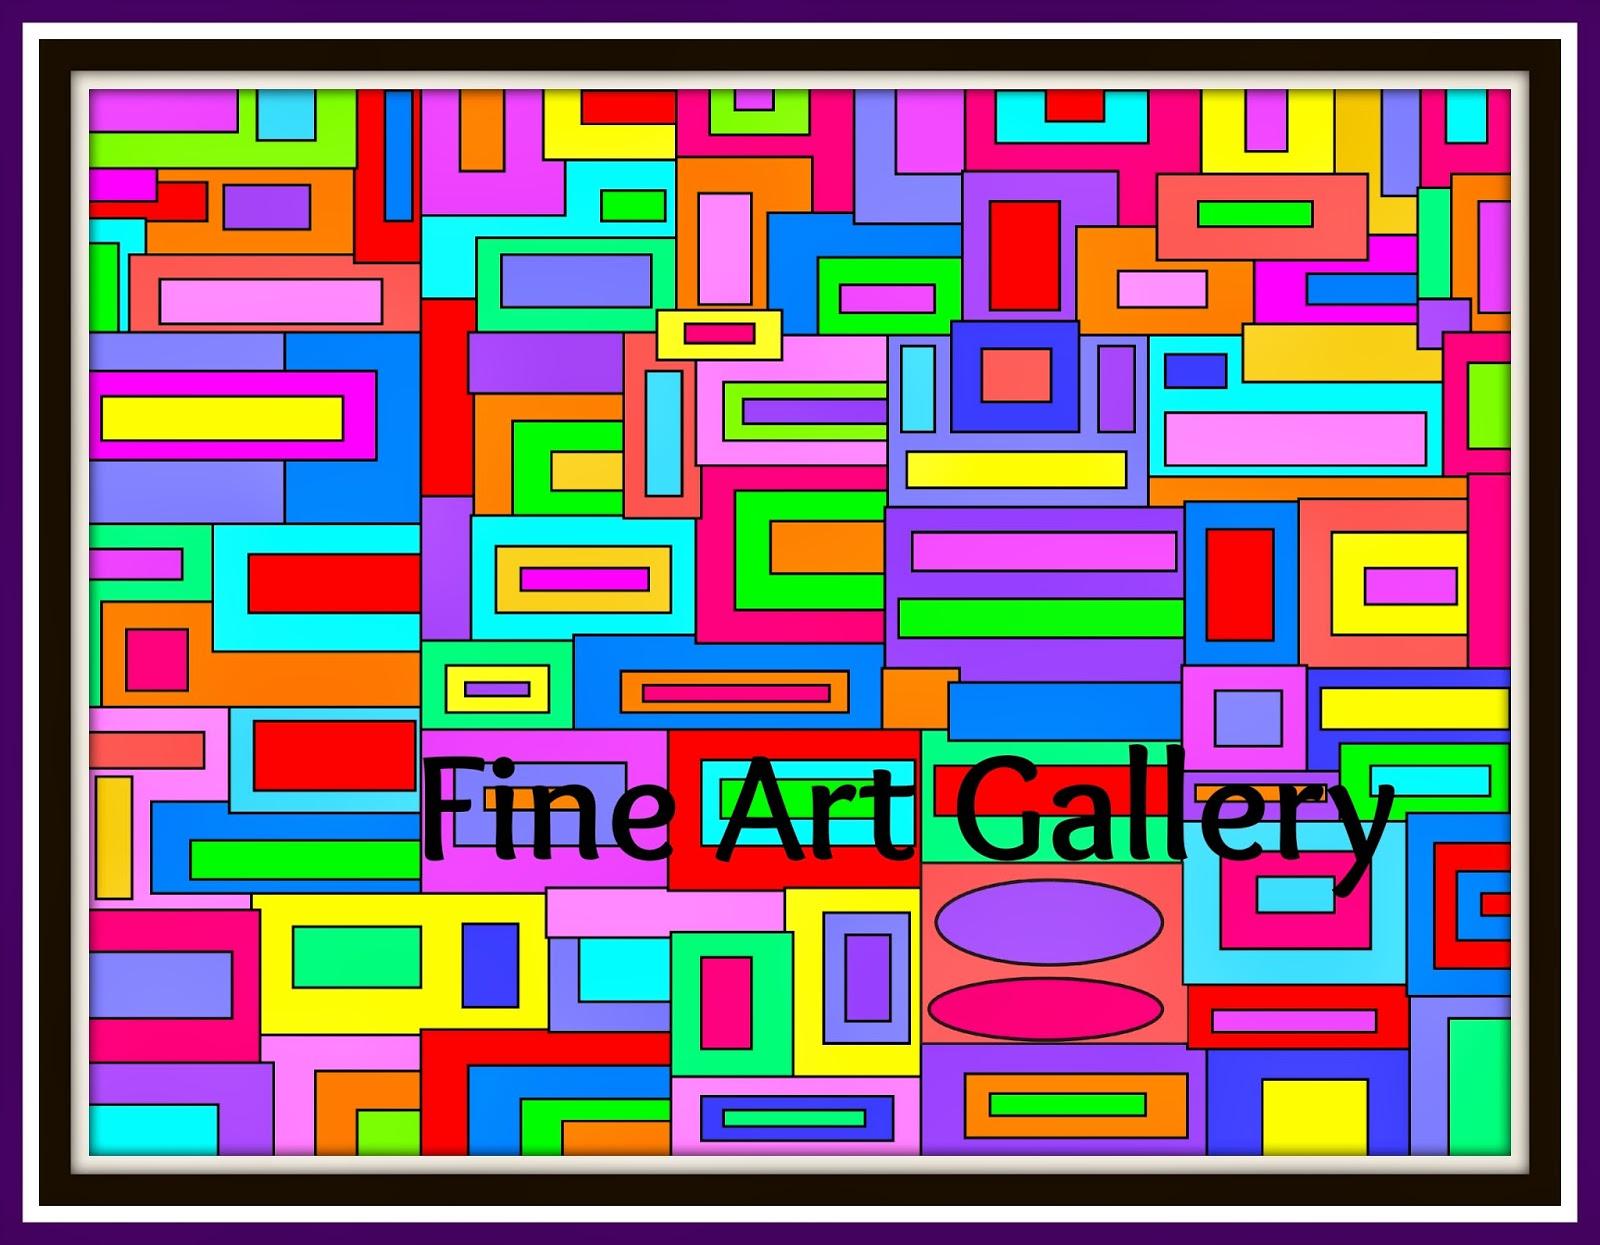 http://florentinasong.blogspot.com/p/art-for-sale.html